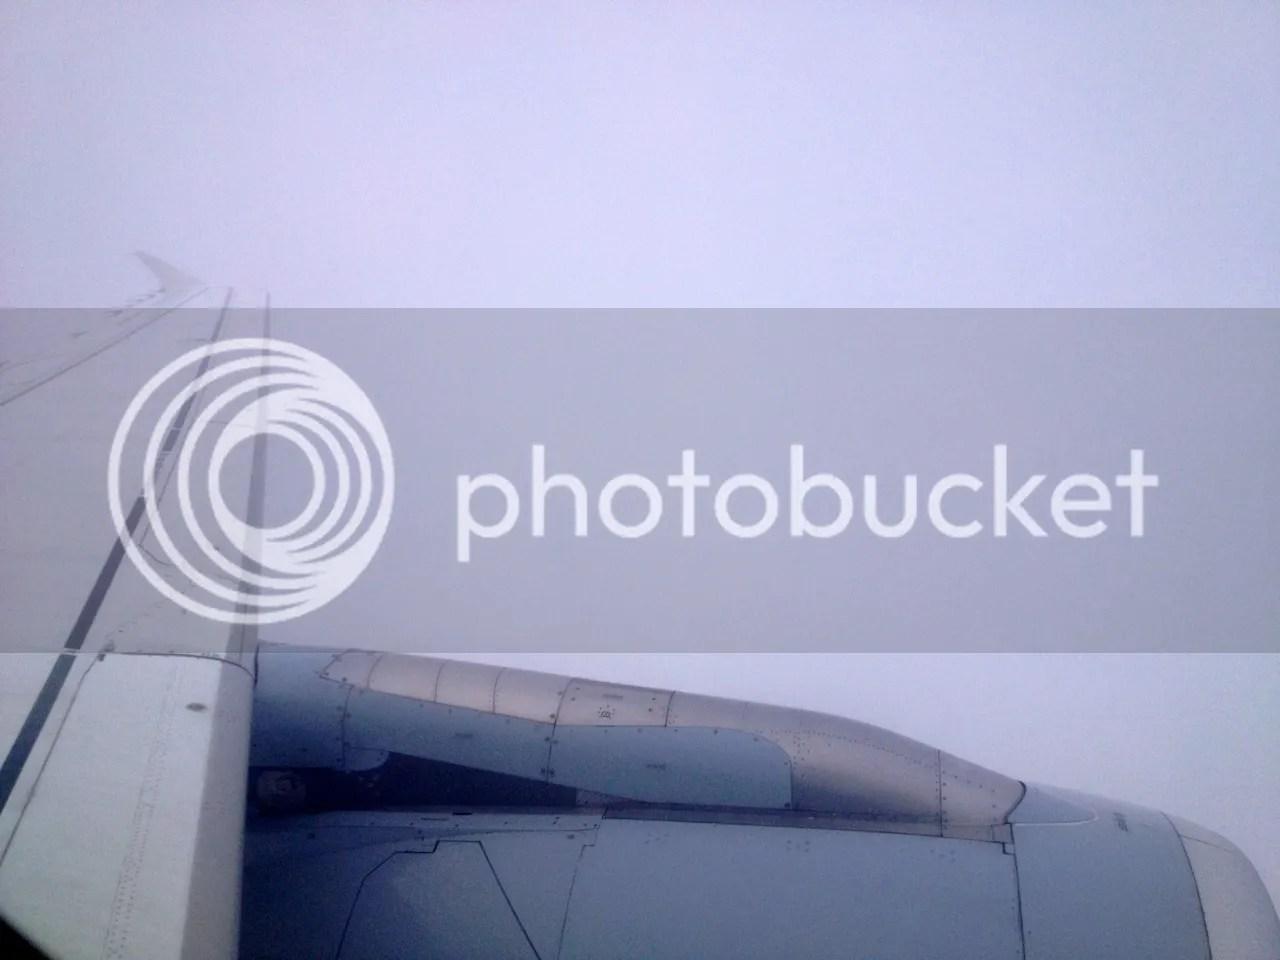 https://i2.wp.com/i181.photobucket.com/albums/x35/jwhite9185/Milan/file-45.jpg